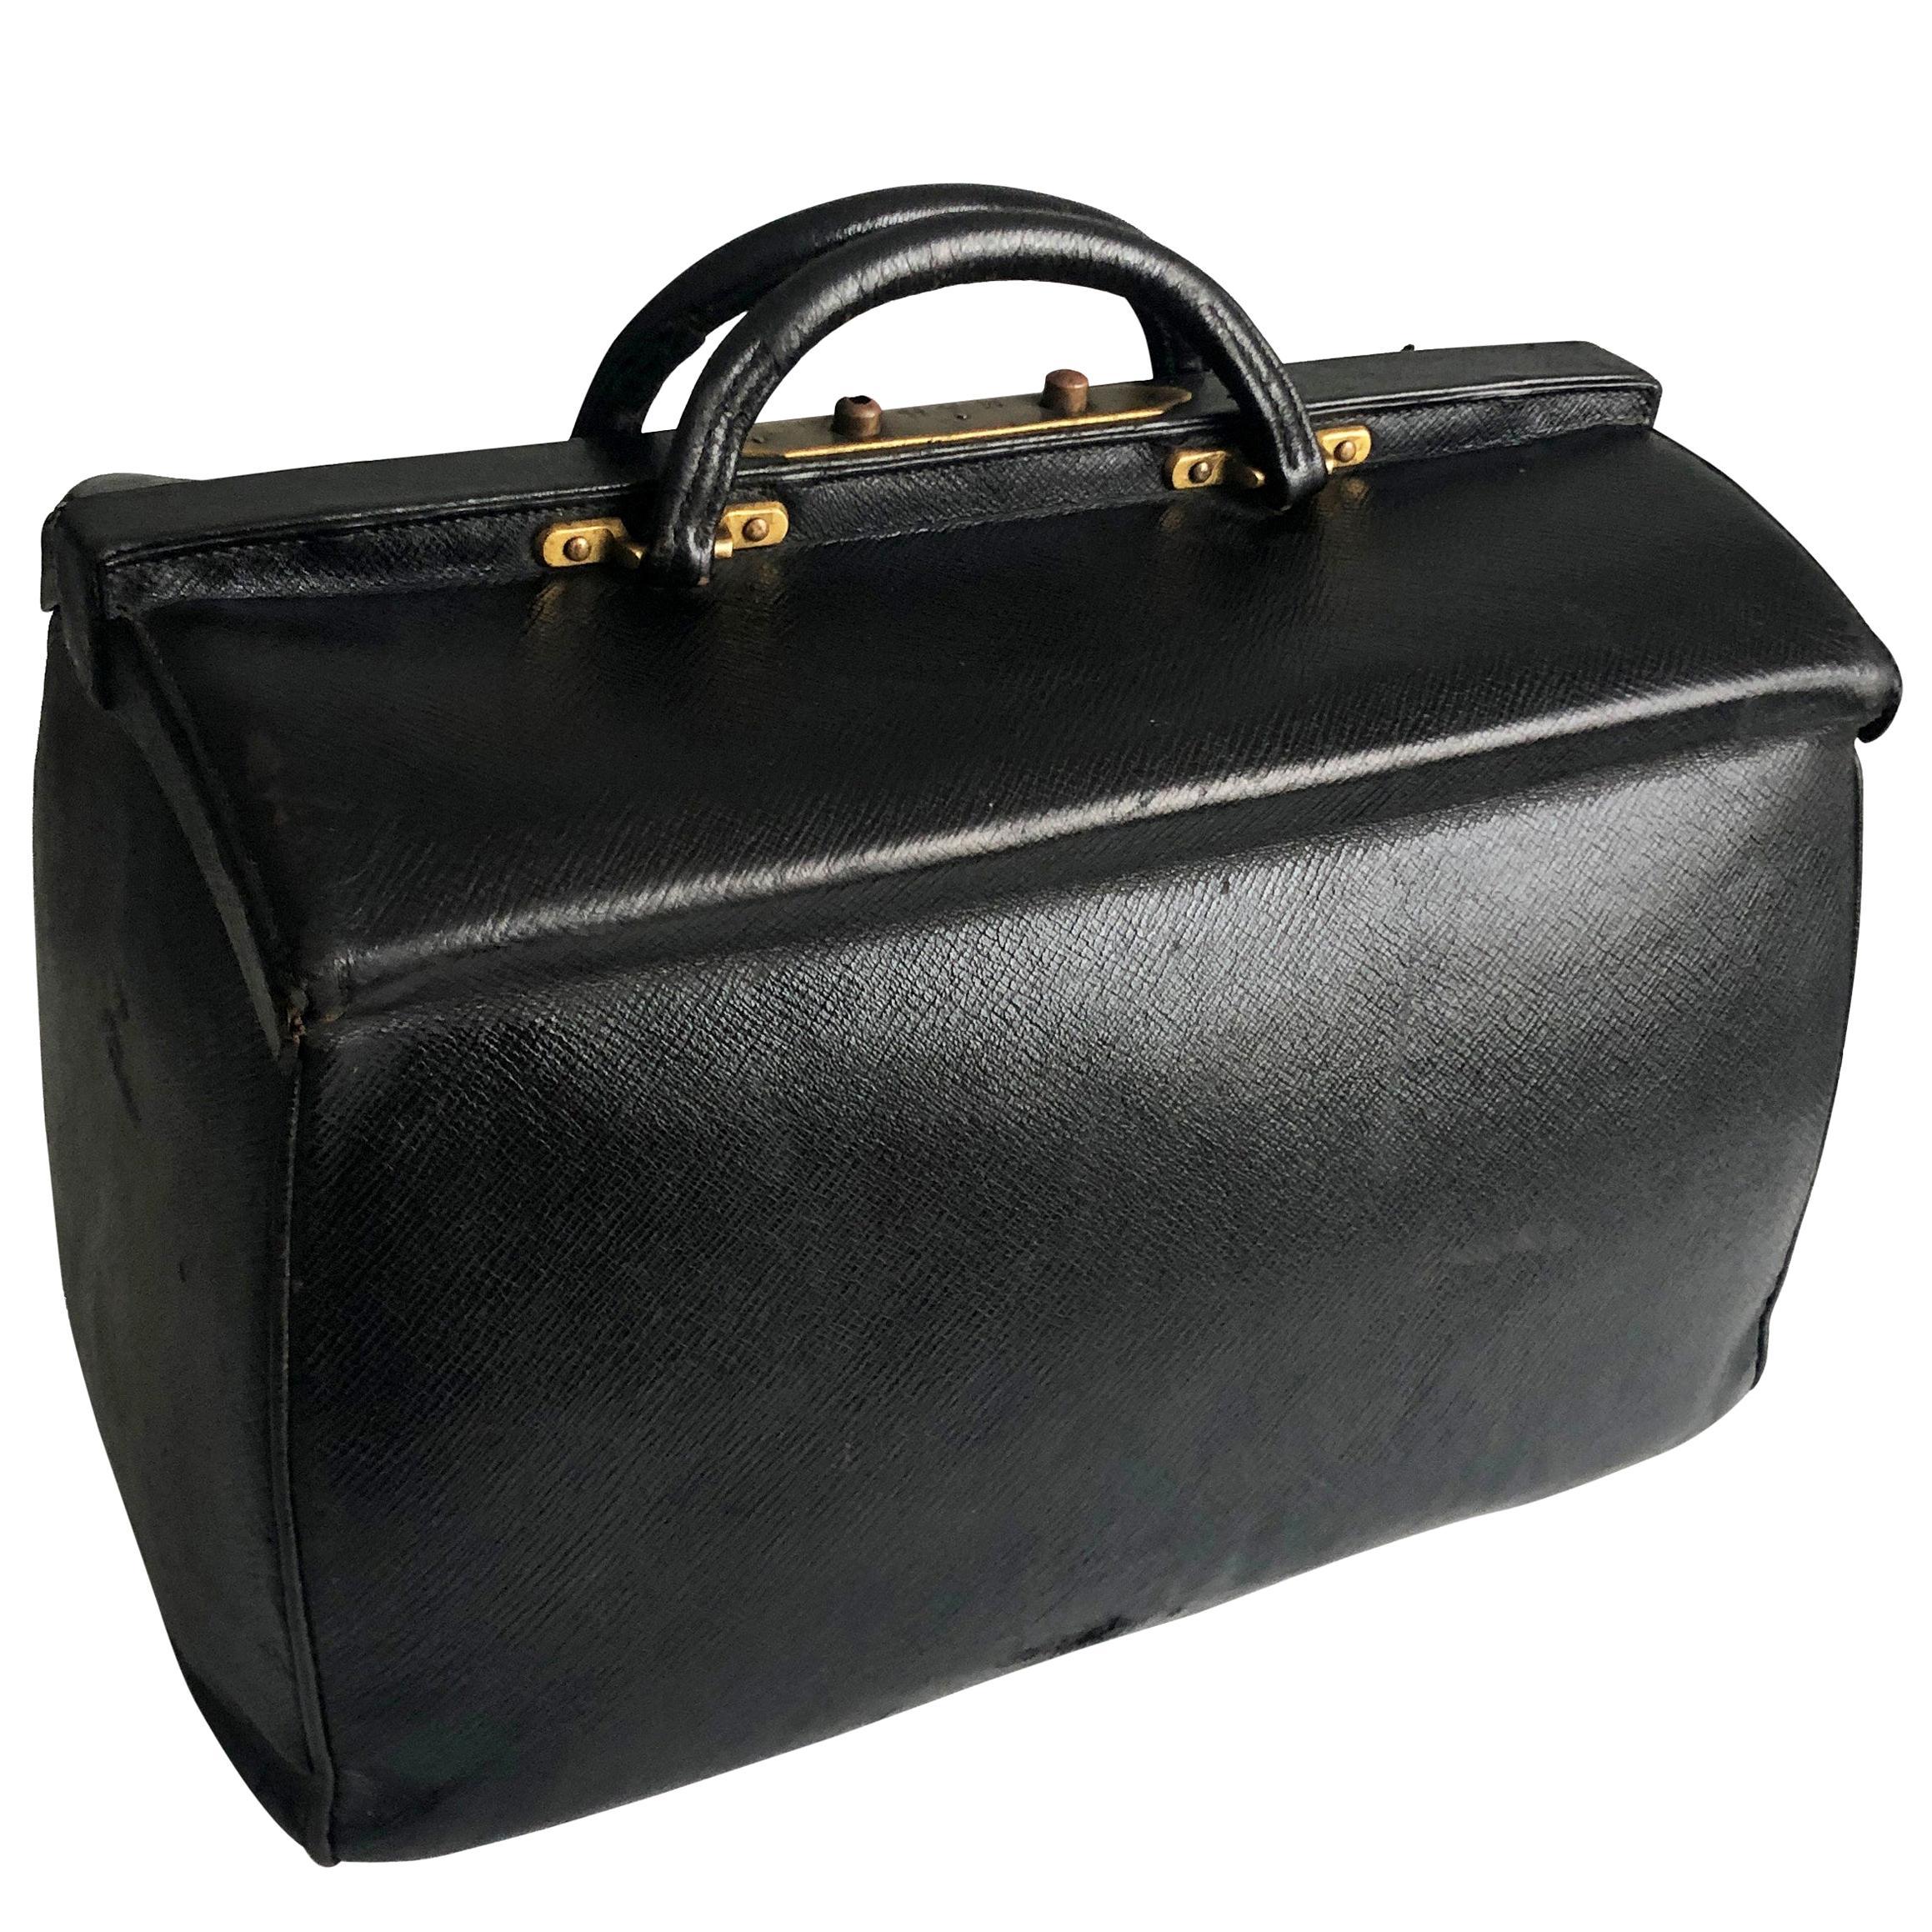 Antique Louis Vuitton Black Doctors Bag Sac Cabine Rare Travel Bag Early 20th C